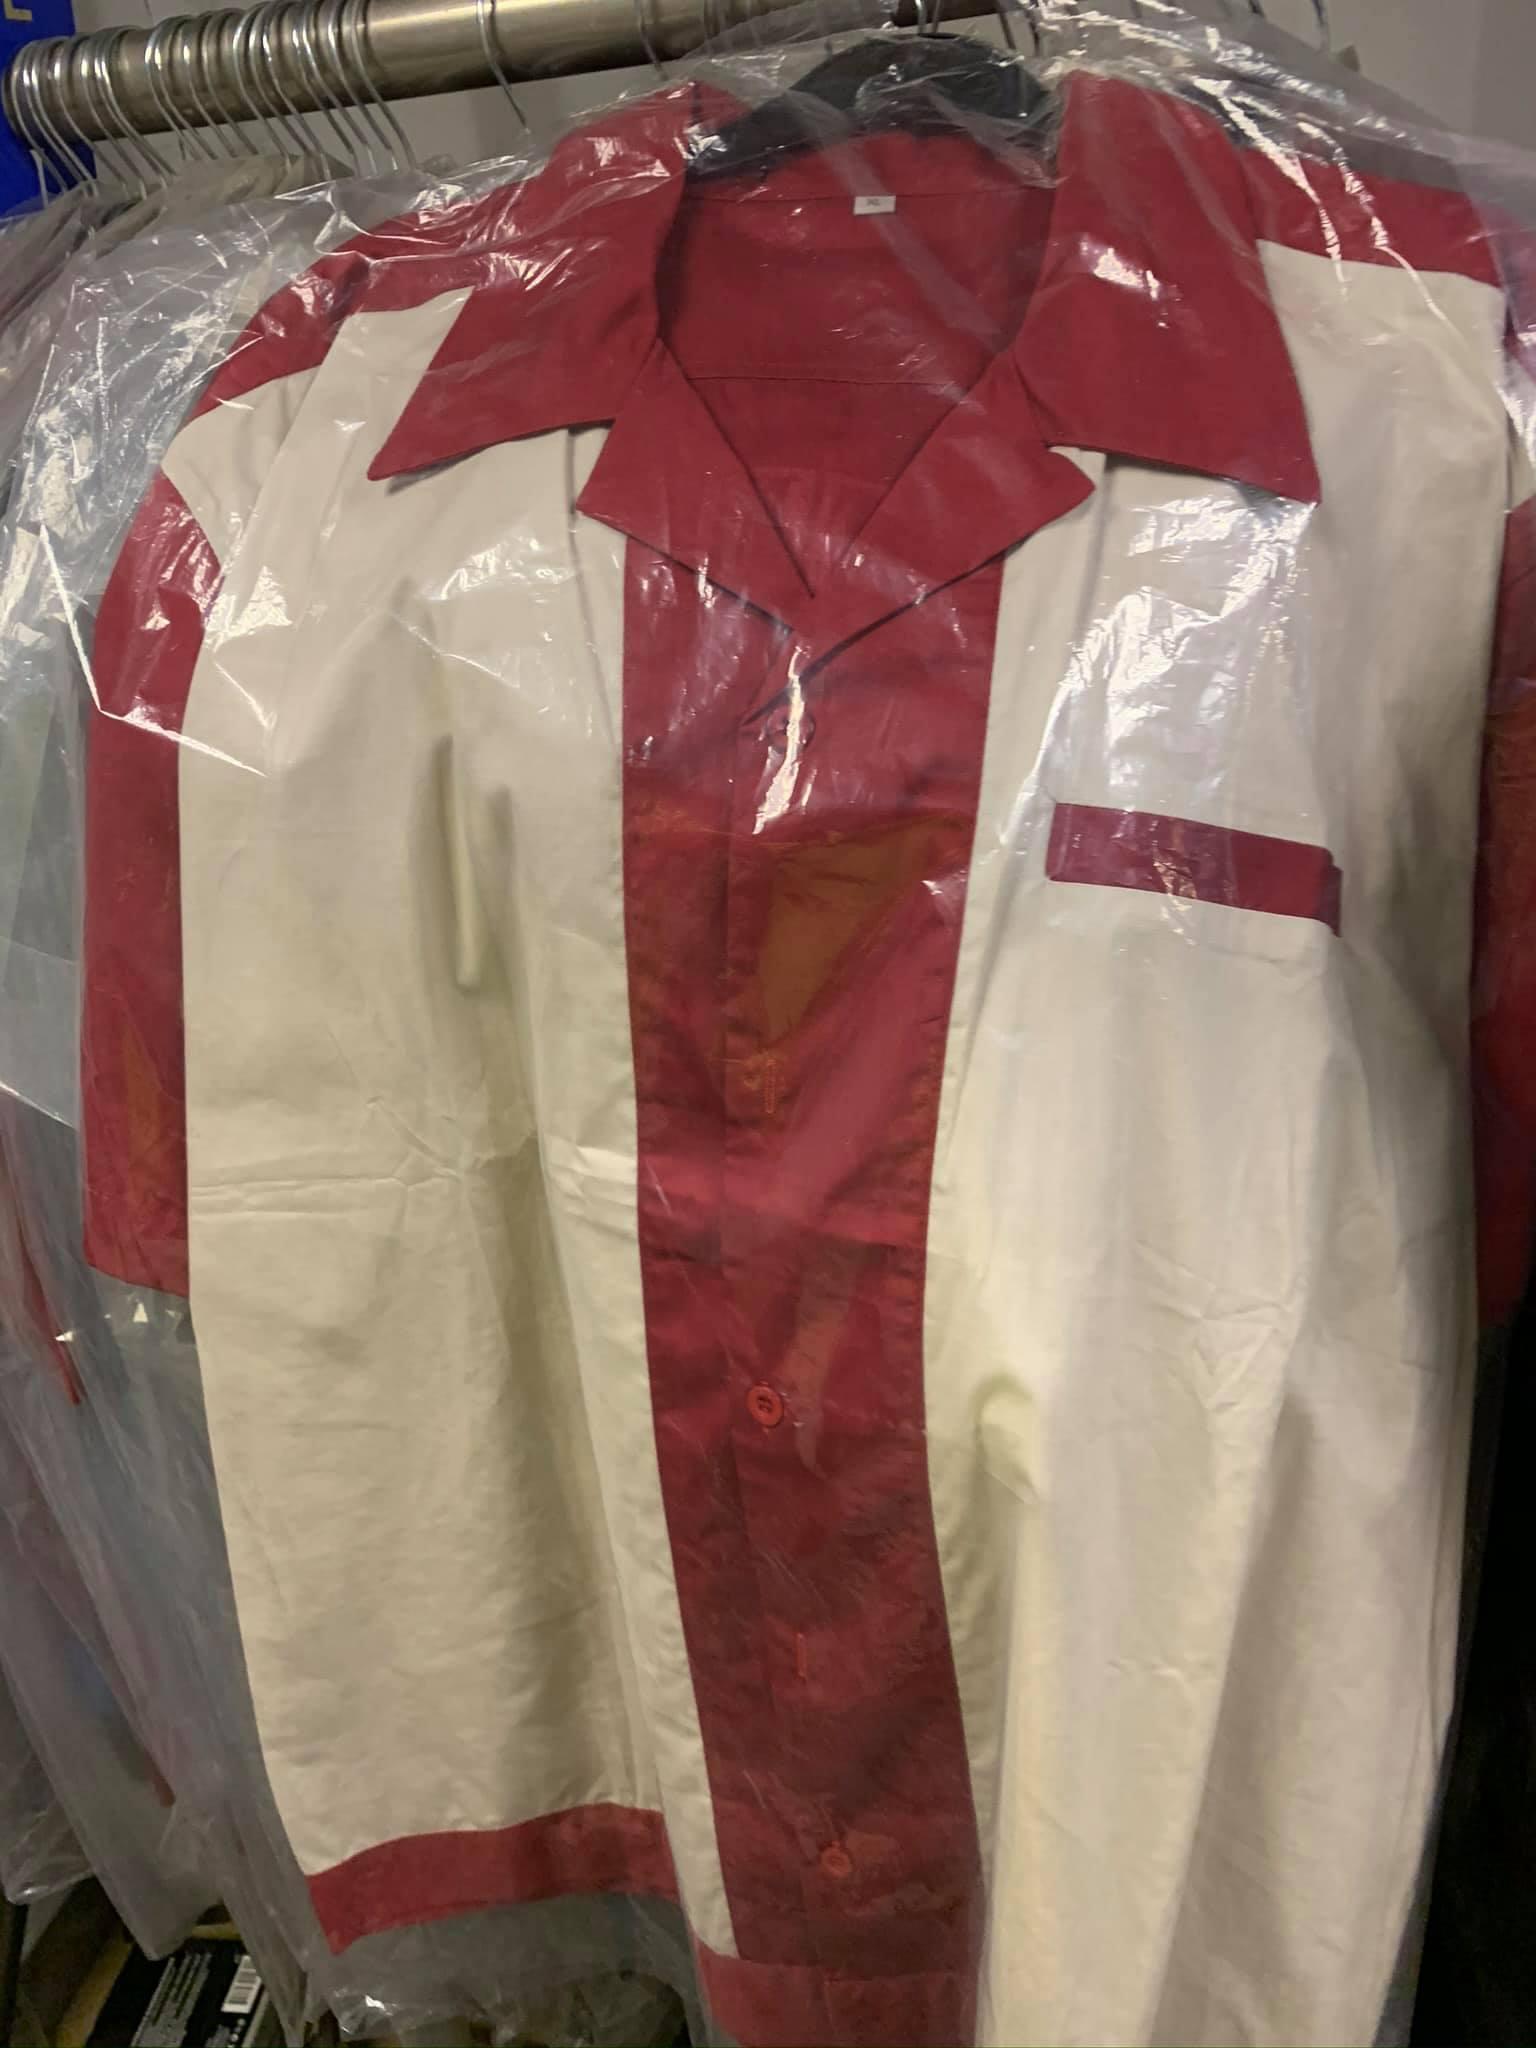 Splinterwood Bowling Shirt - Burgundy wiith white panels ,